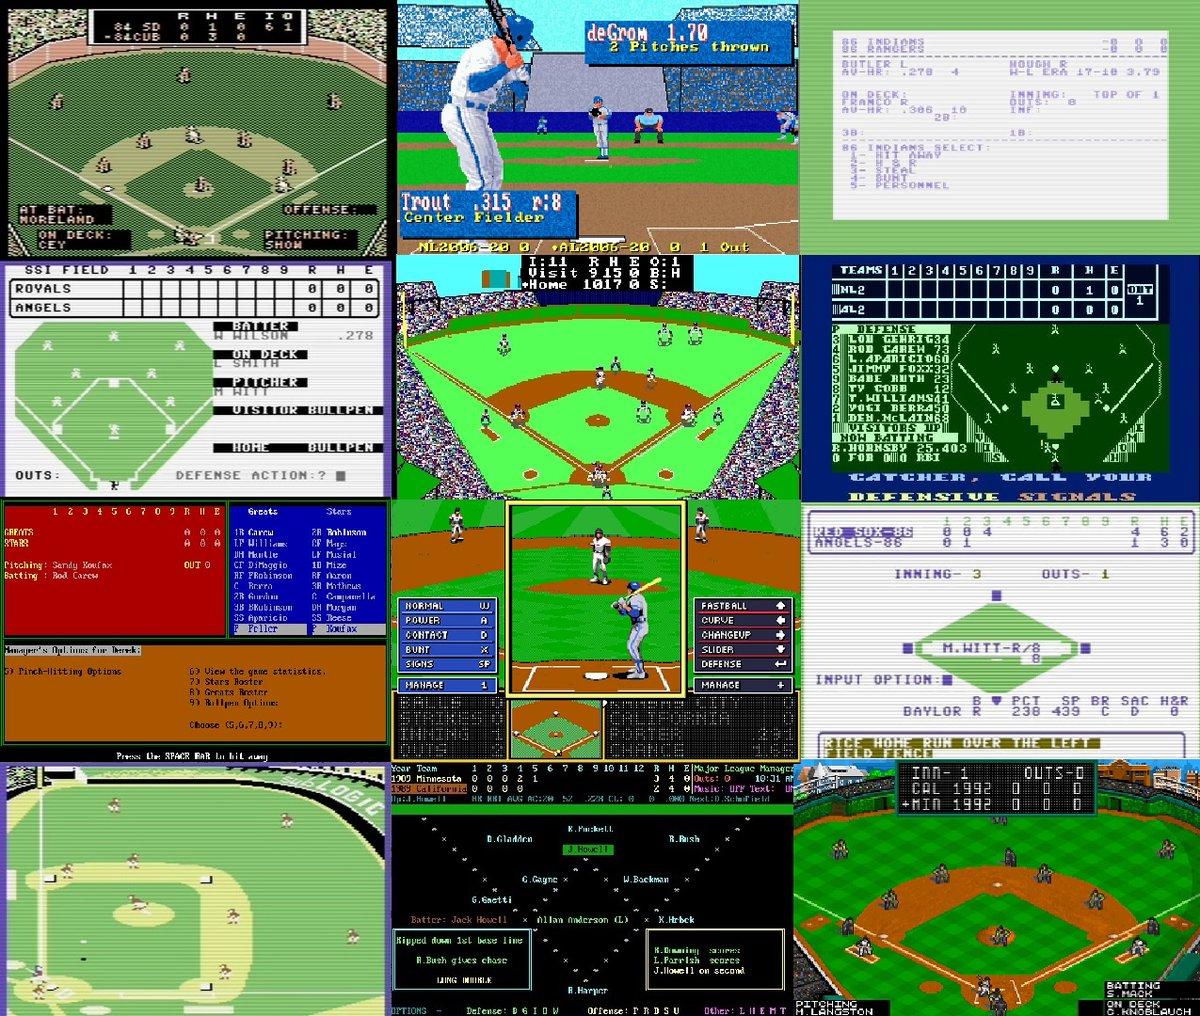 Retro Computer Baseball Game Reviews - a series focusing on computer baseball simulations https://t.co/dZdviIKEt7... #amiga #apple #atari #commodore #ibm #macintosh #tandy #electronicArts #MicroLeague #LanceHaffner #SSI #AvalonHill #Stormfront #SubLogic #retrogaming #APBA #strat https://t.co/4dRH7WVeV9